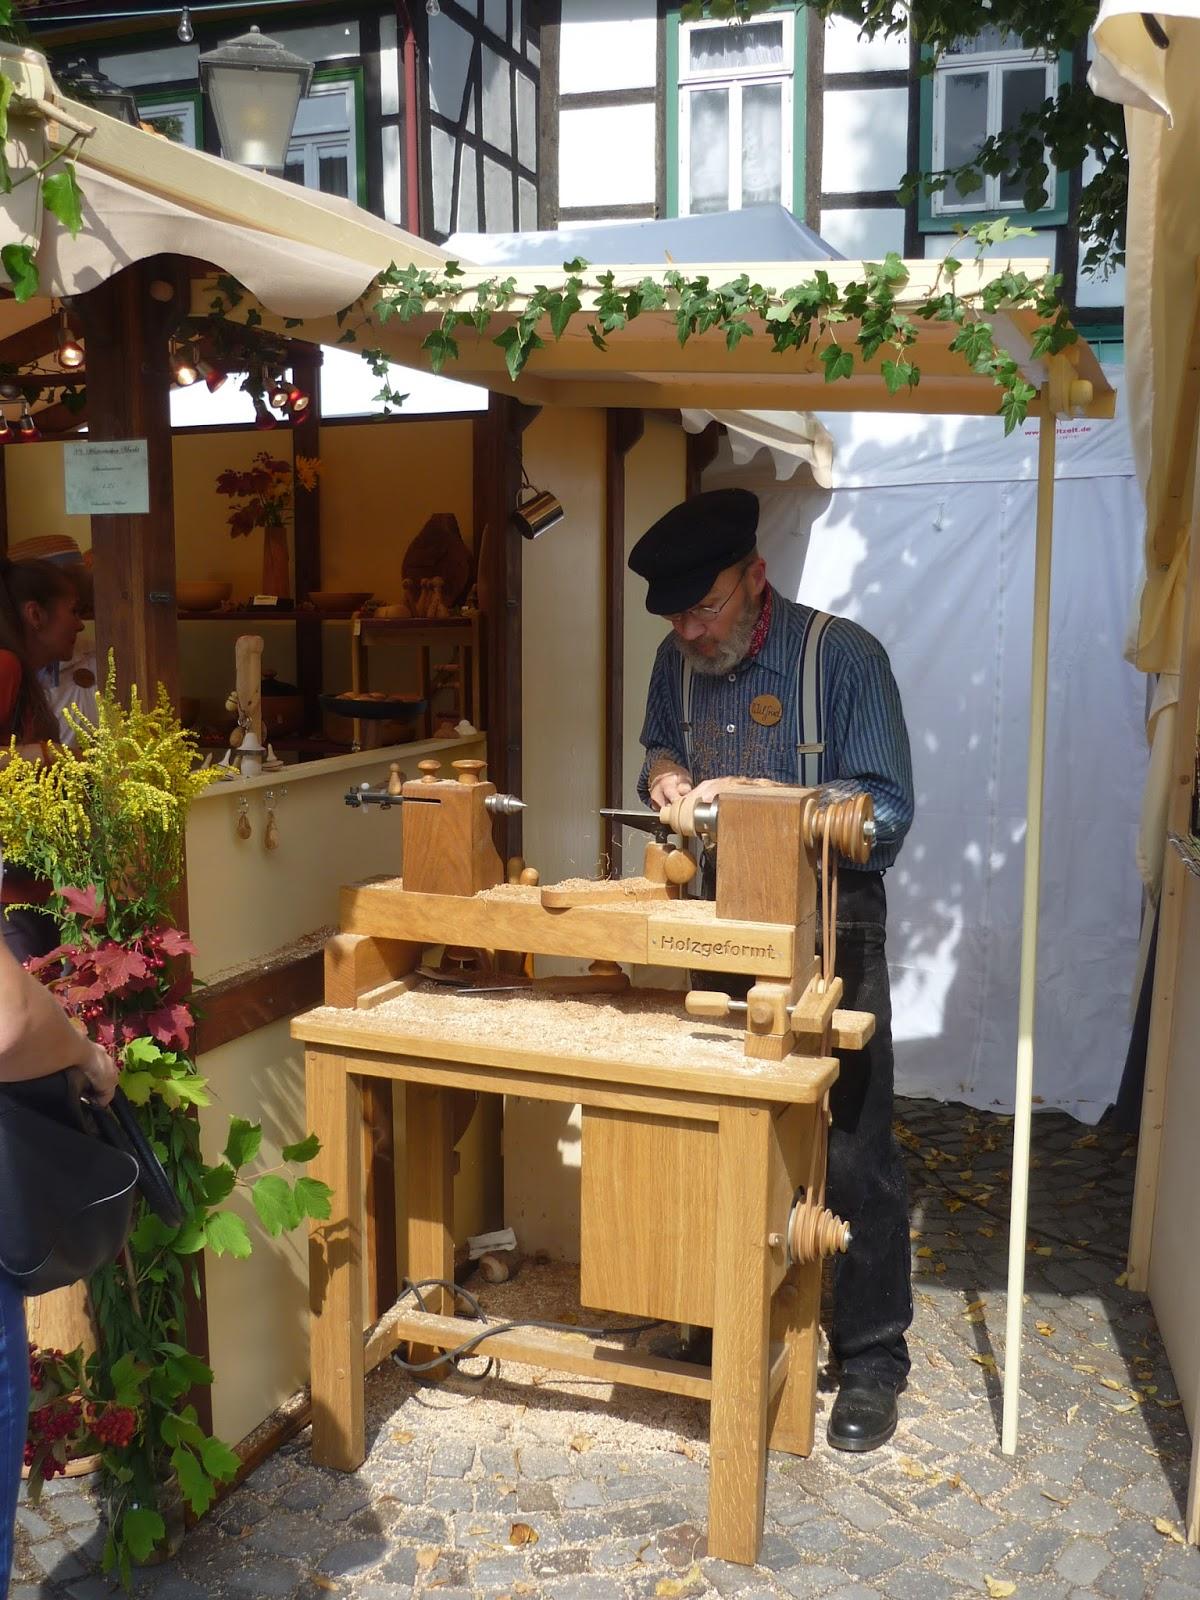 Handarbeiten: Historischer Markt in Bad Essen 2013